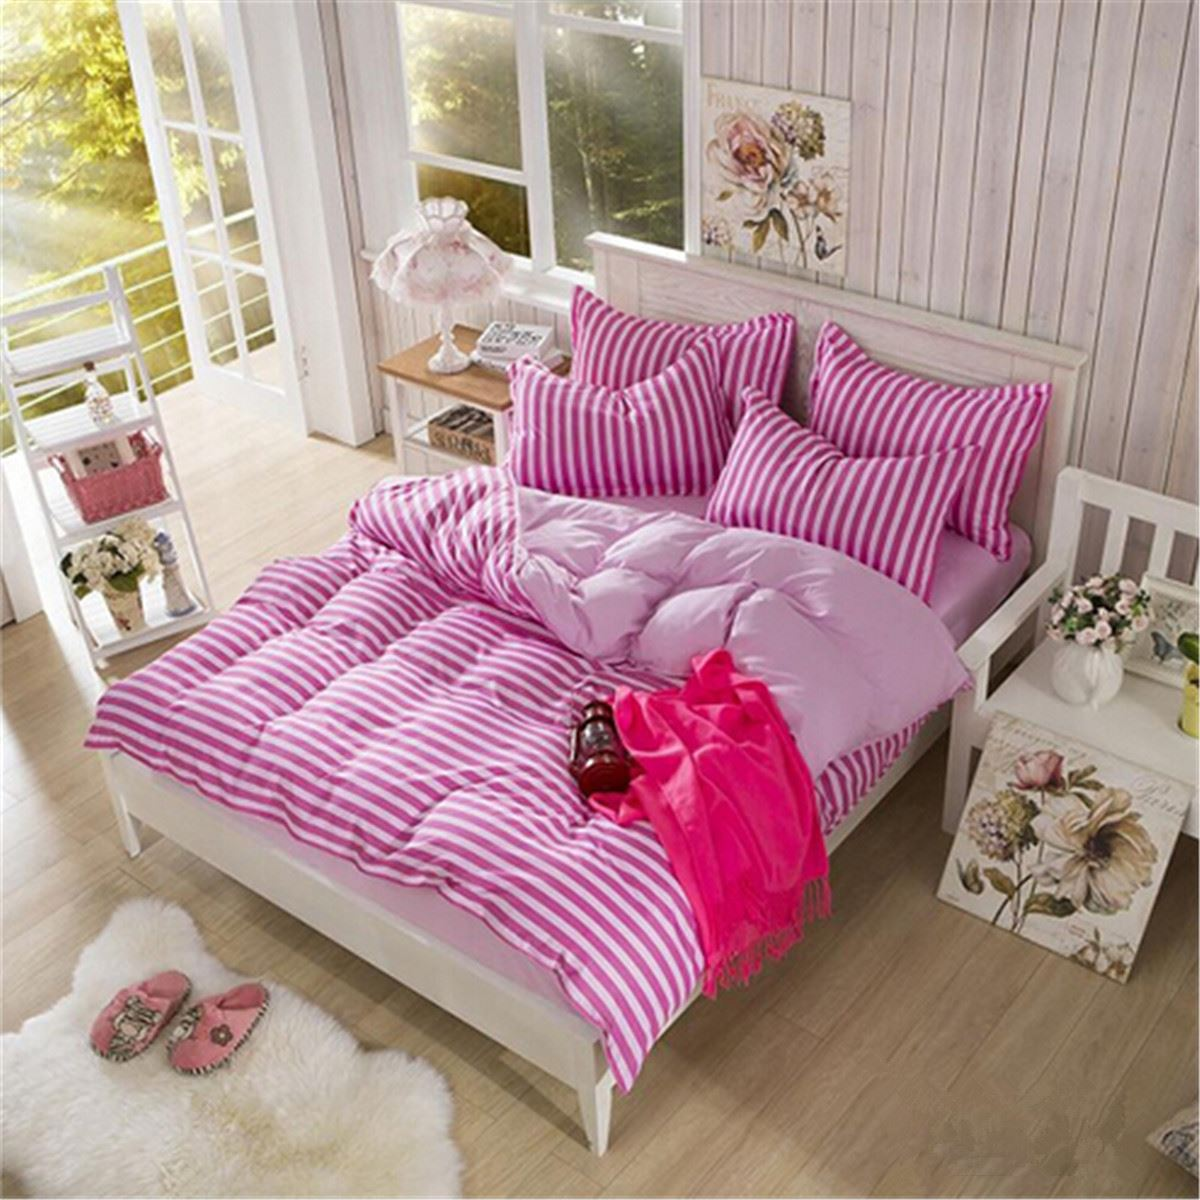 Bed sheet set with quilt - Korean Polyester Fiber Quilt Duvet Cover Pink Stripe Printed Bedding Set Bed Sheet Pillow Case Single